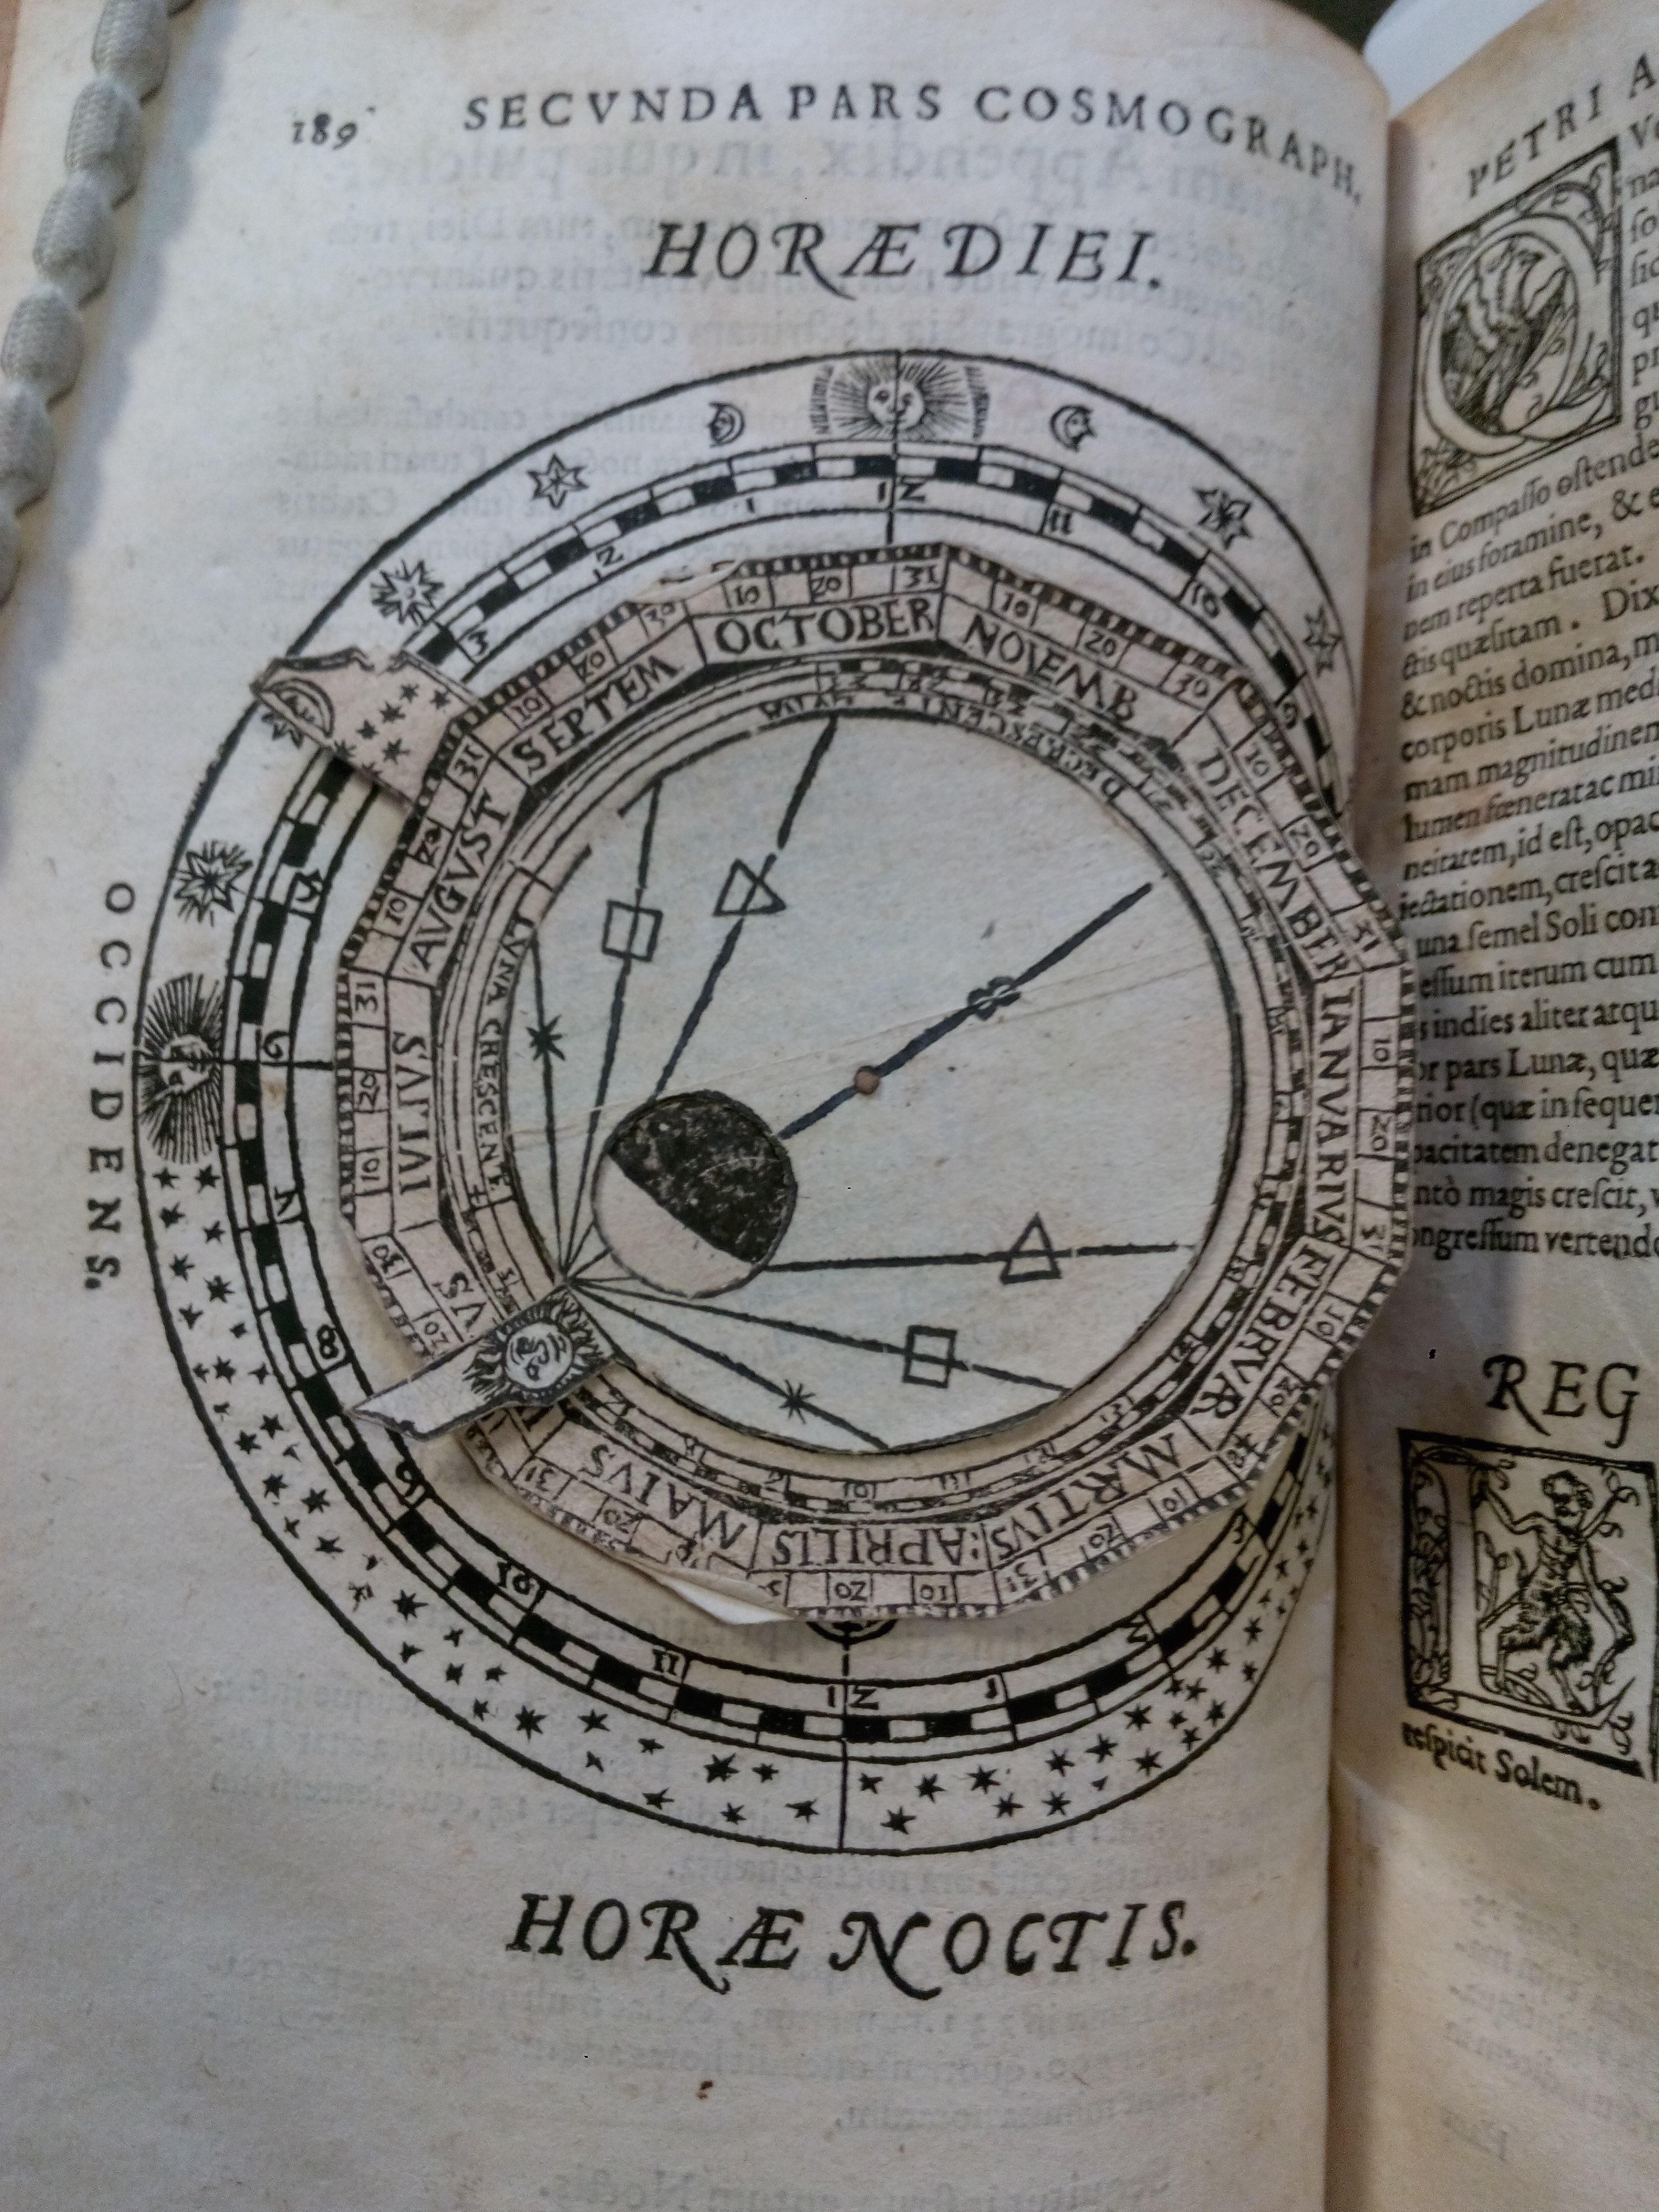 """Peter Apian, Cosmographia, sive descriptio universi orbis, Petri Apiani & Gemmae Frisij (Antwerp: Johannes Withagius, 1584), p. 189. University of St Andrews Library, TypNAn.B84BA"""